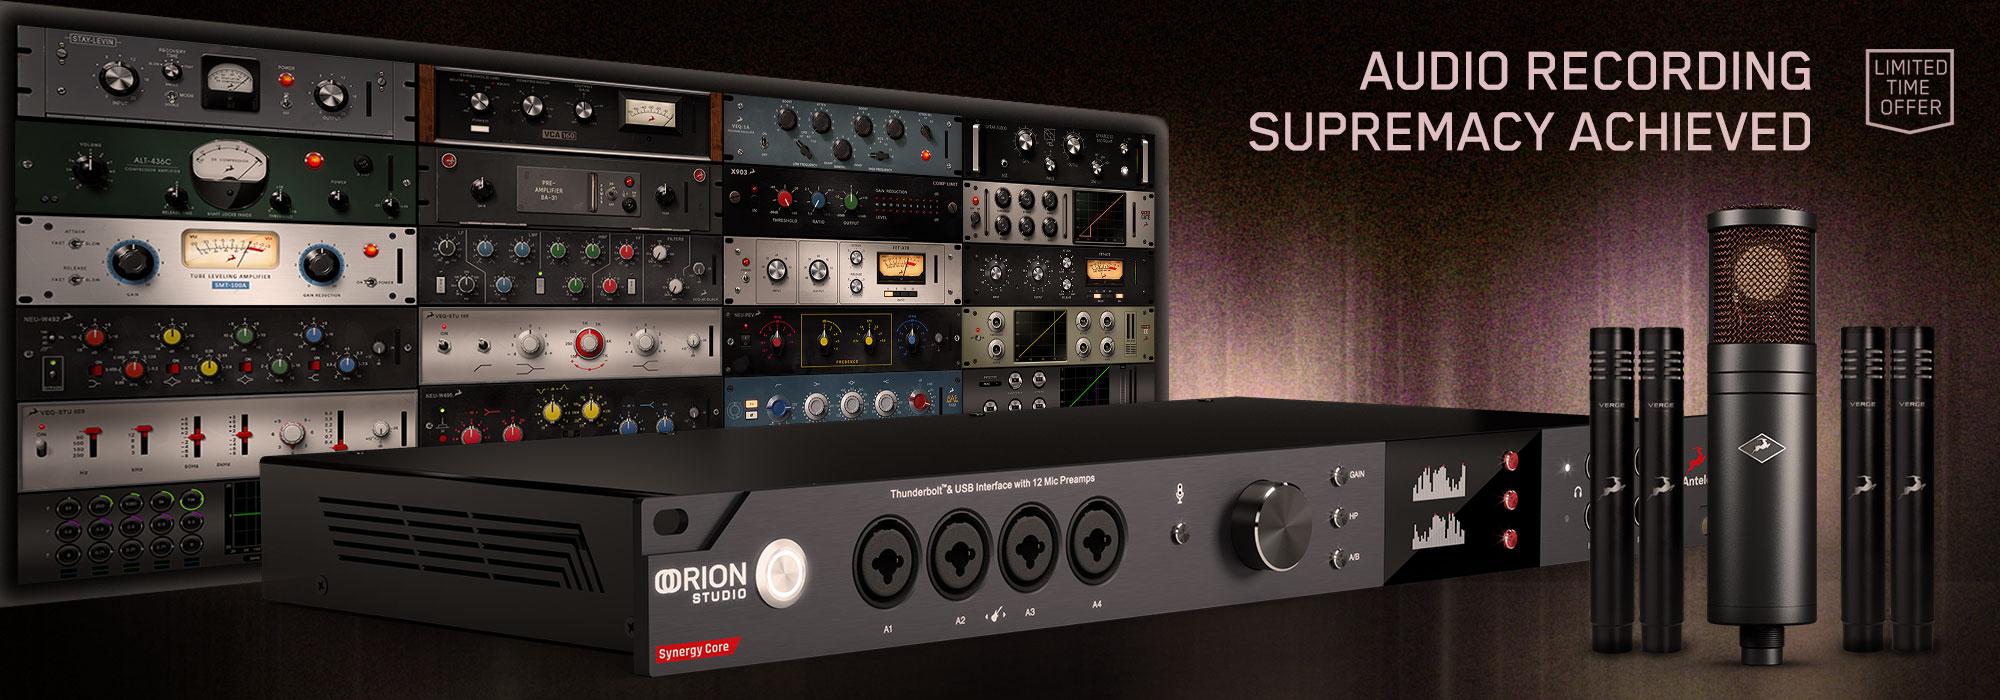 Oferta Antelope Audio: micrófonos y plug-ins gratis con tu nueva interfaz Synergy Core